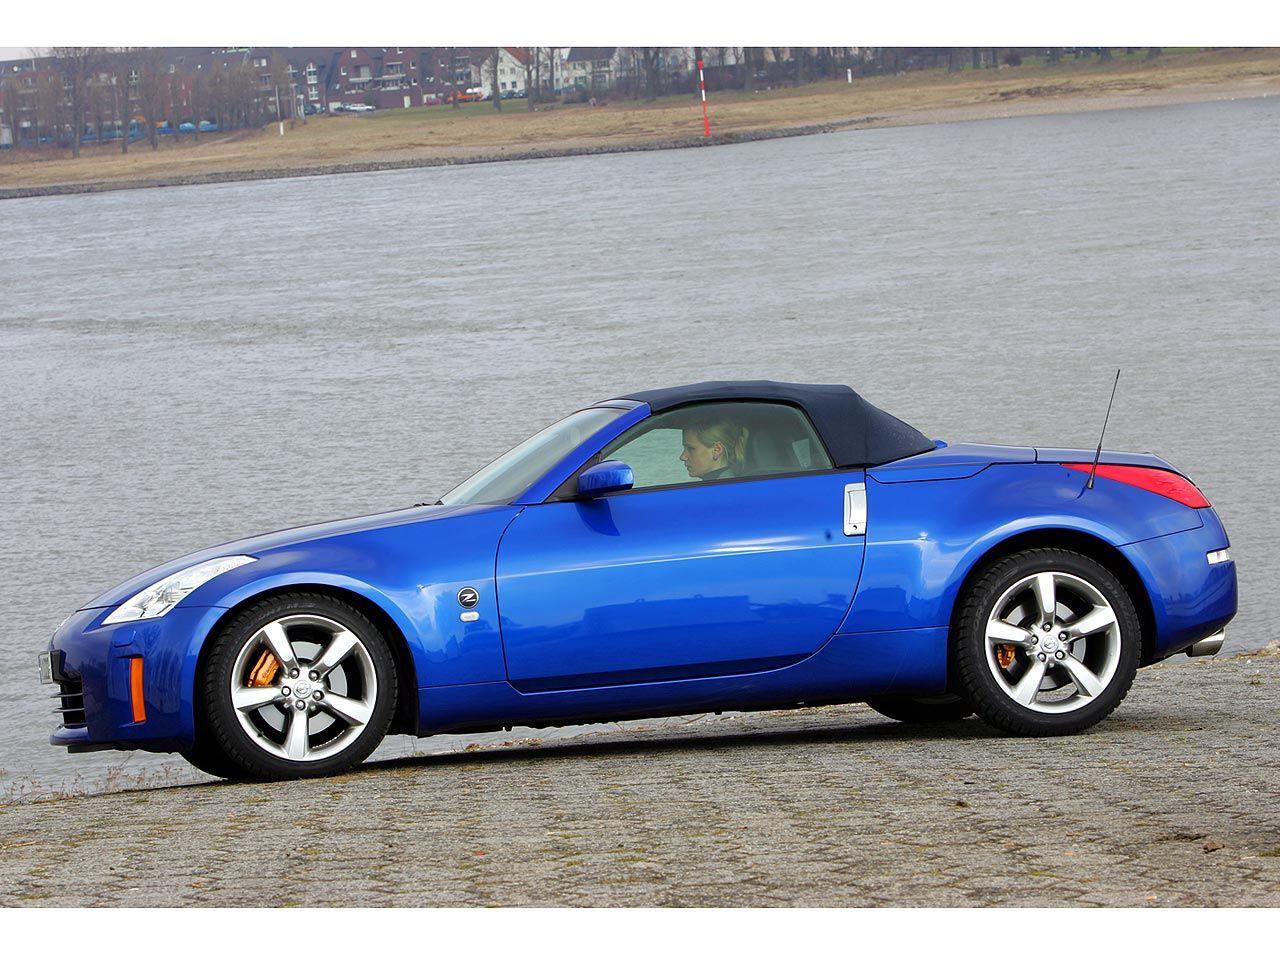 nissan 350z roadster im dauertest | autozeitung.de